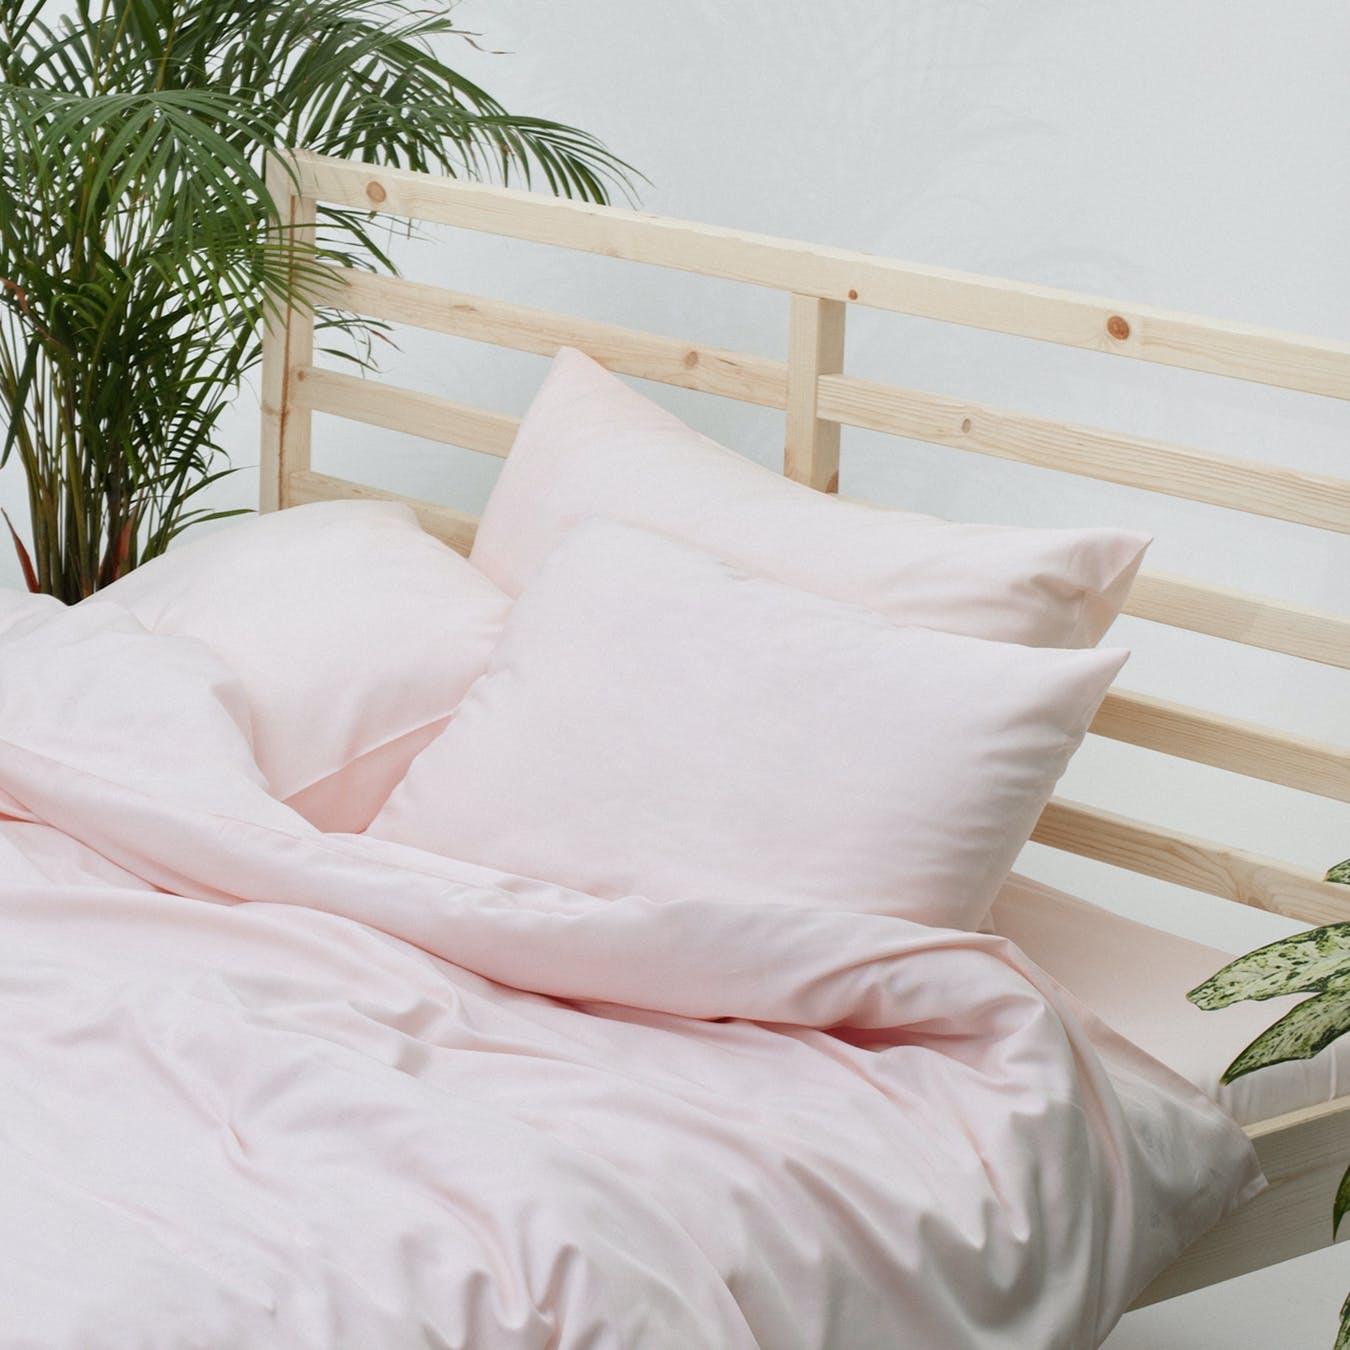 Double Sateen Duvet Set Duvet Cover 2 Pillow Cases Light Pink By Bedroommood Fy